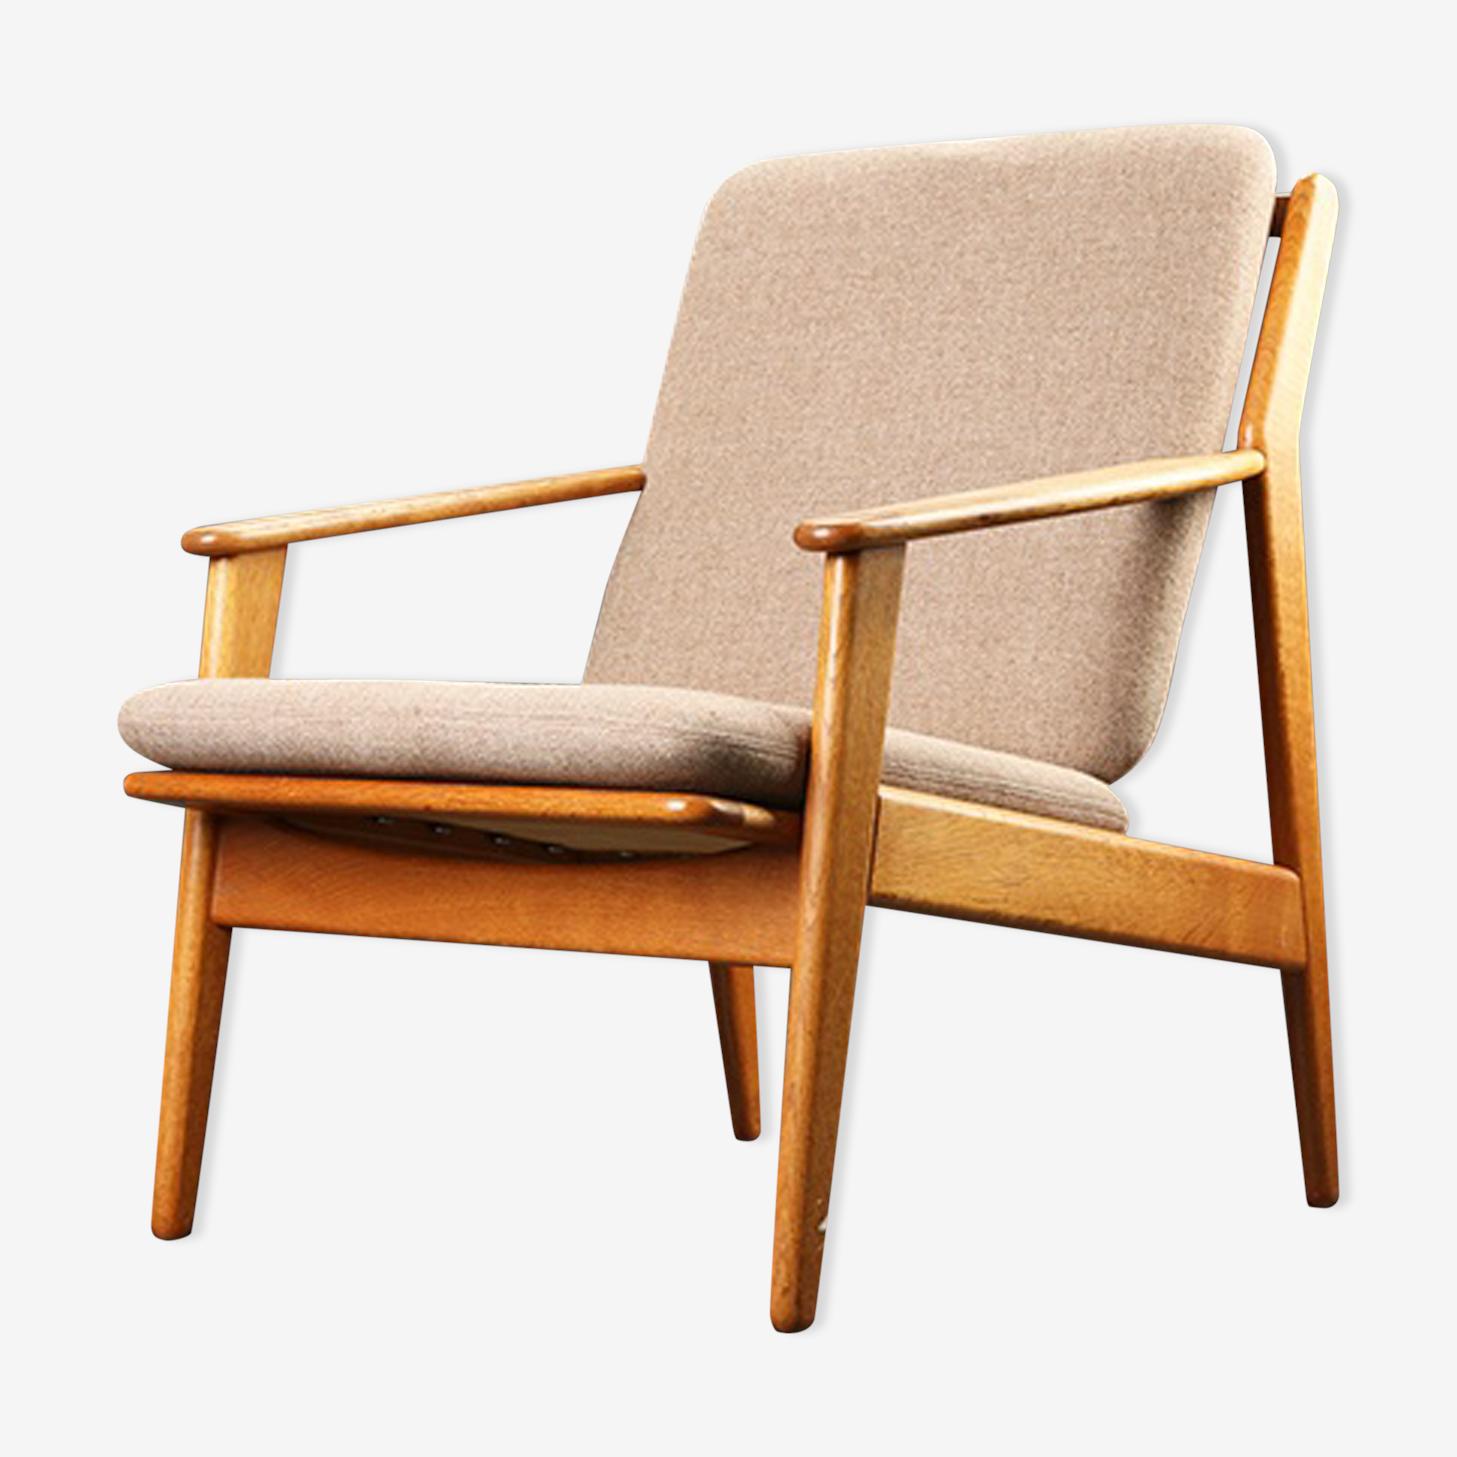 Chair teak model J55